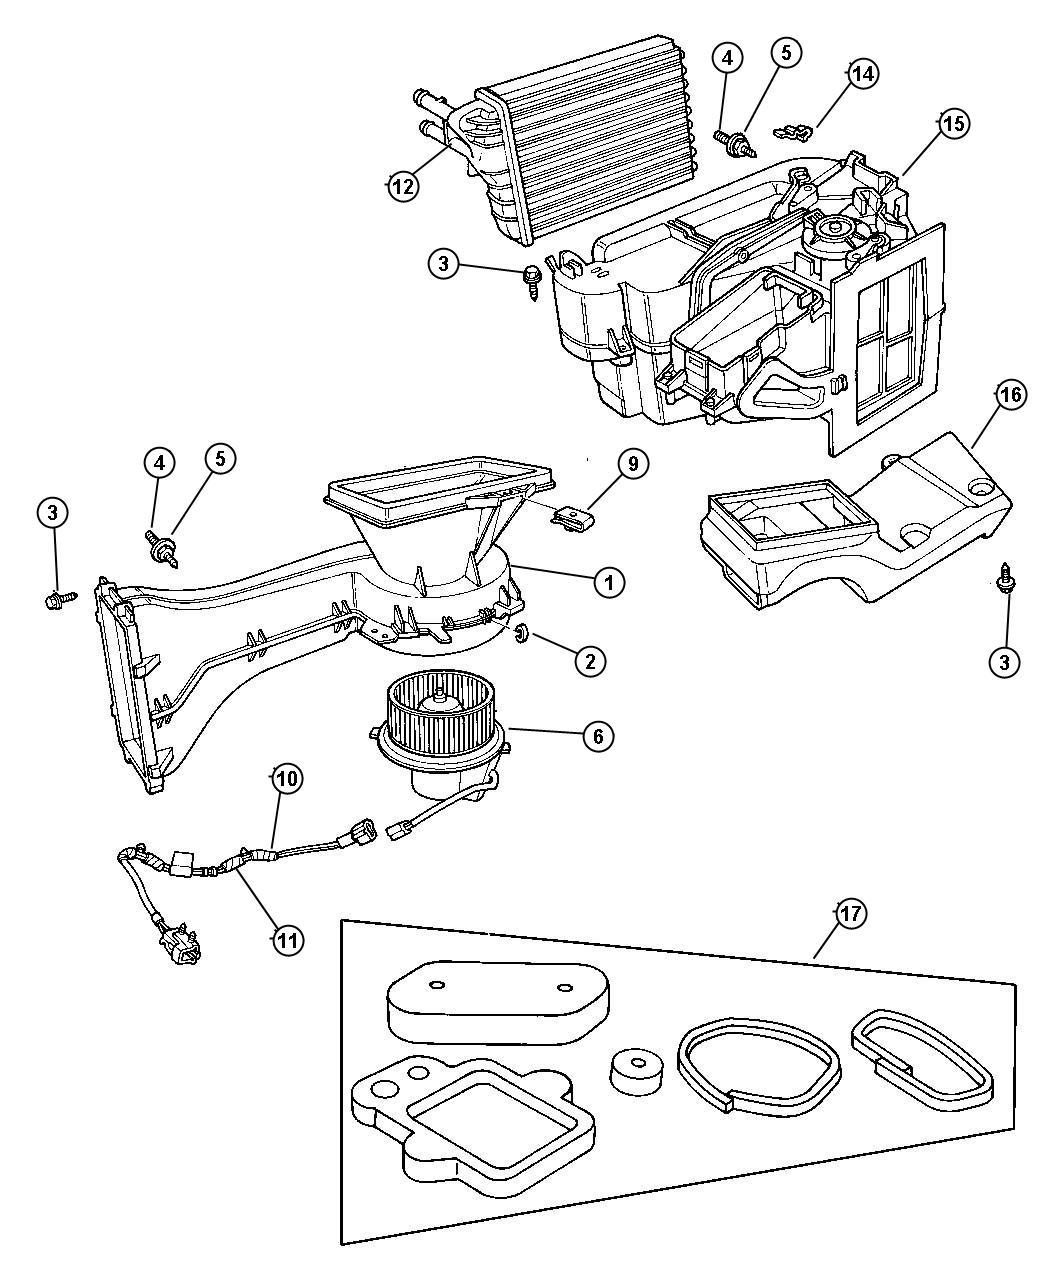 1997 Dodge Neon Motor Package  Heater Blower  Air